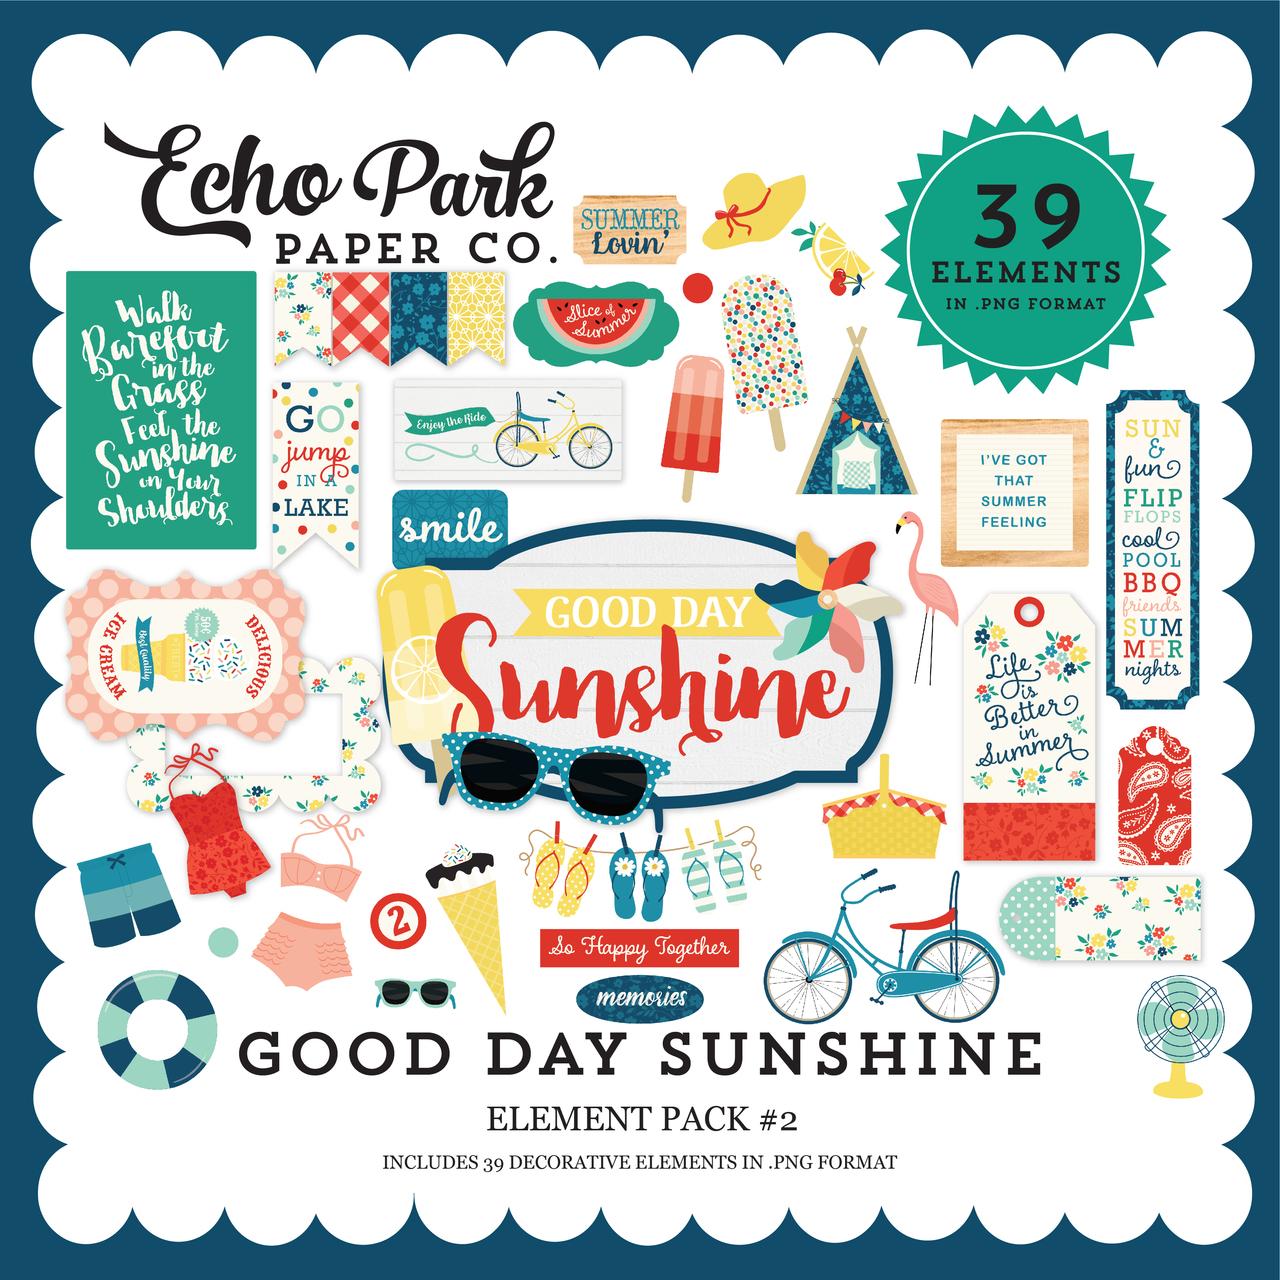 Good Day Sunshine Element Pack #2